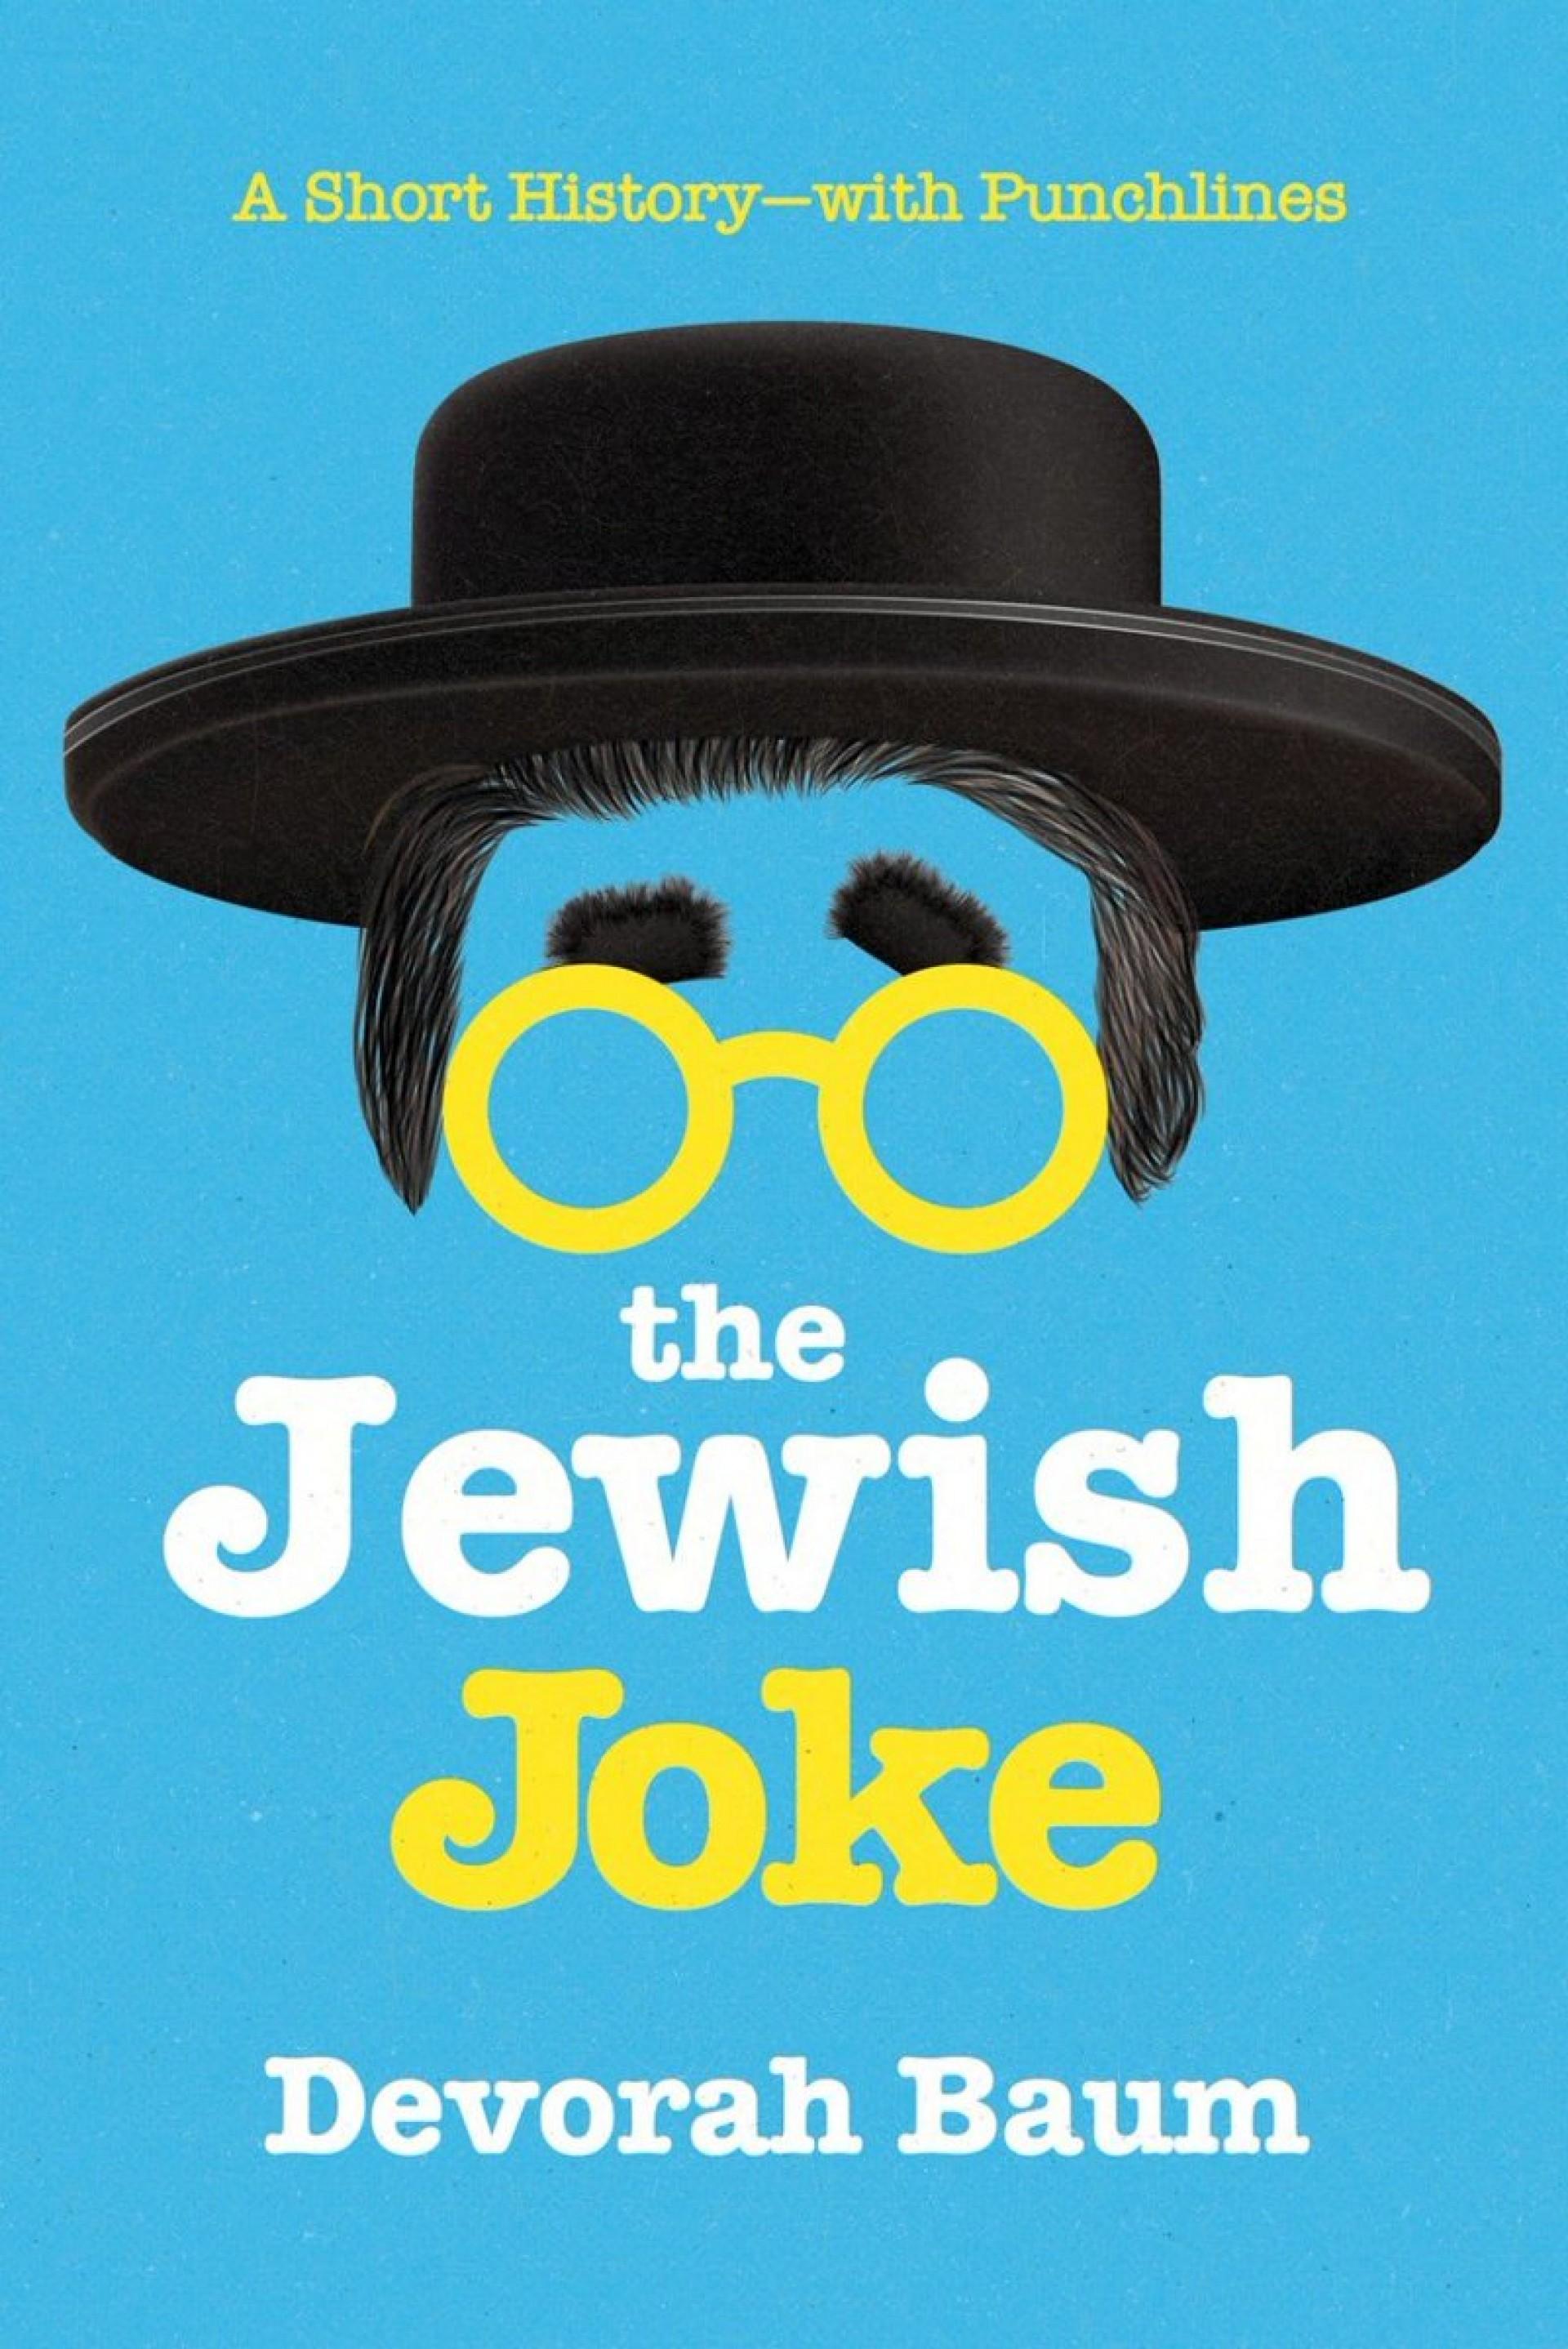 014 Essay Example Ddpiqofx0aahjbp Amazing Joke Writer Joker In Hindi Jokes English 1920